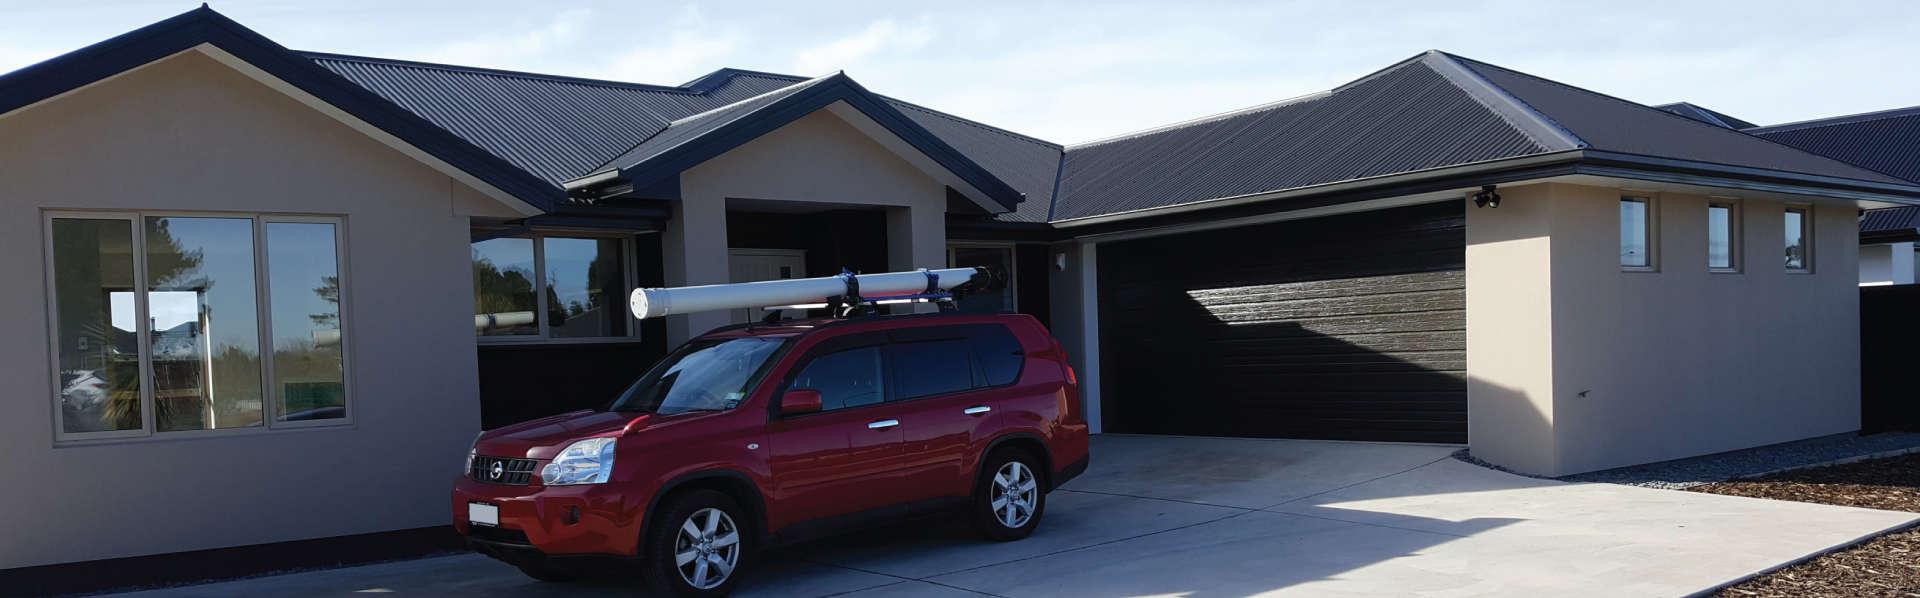 garage-door-repairs-christchurch